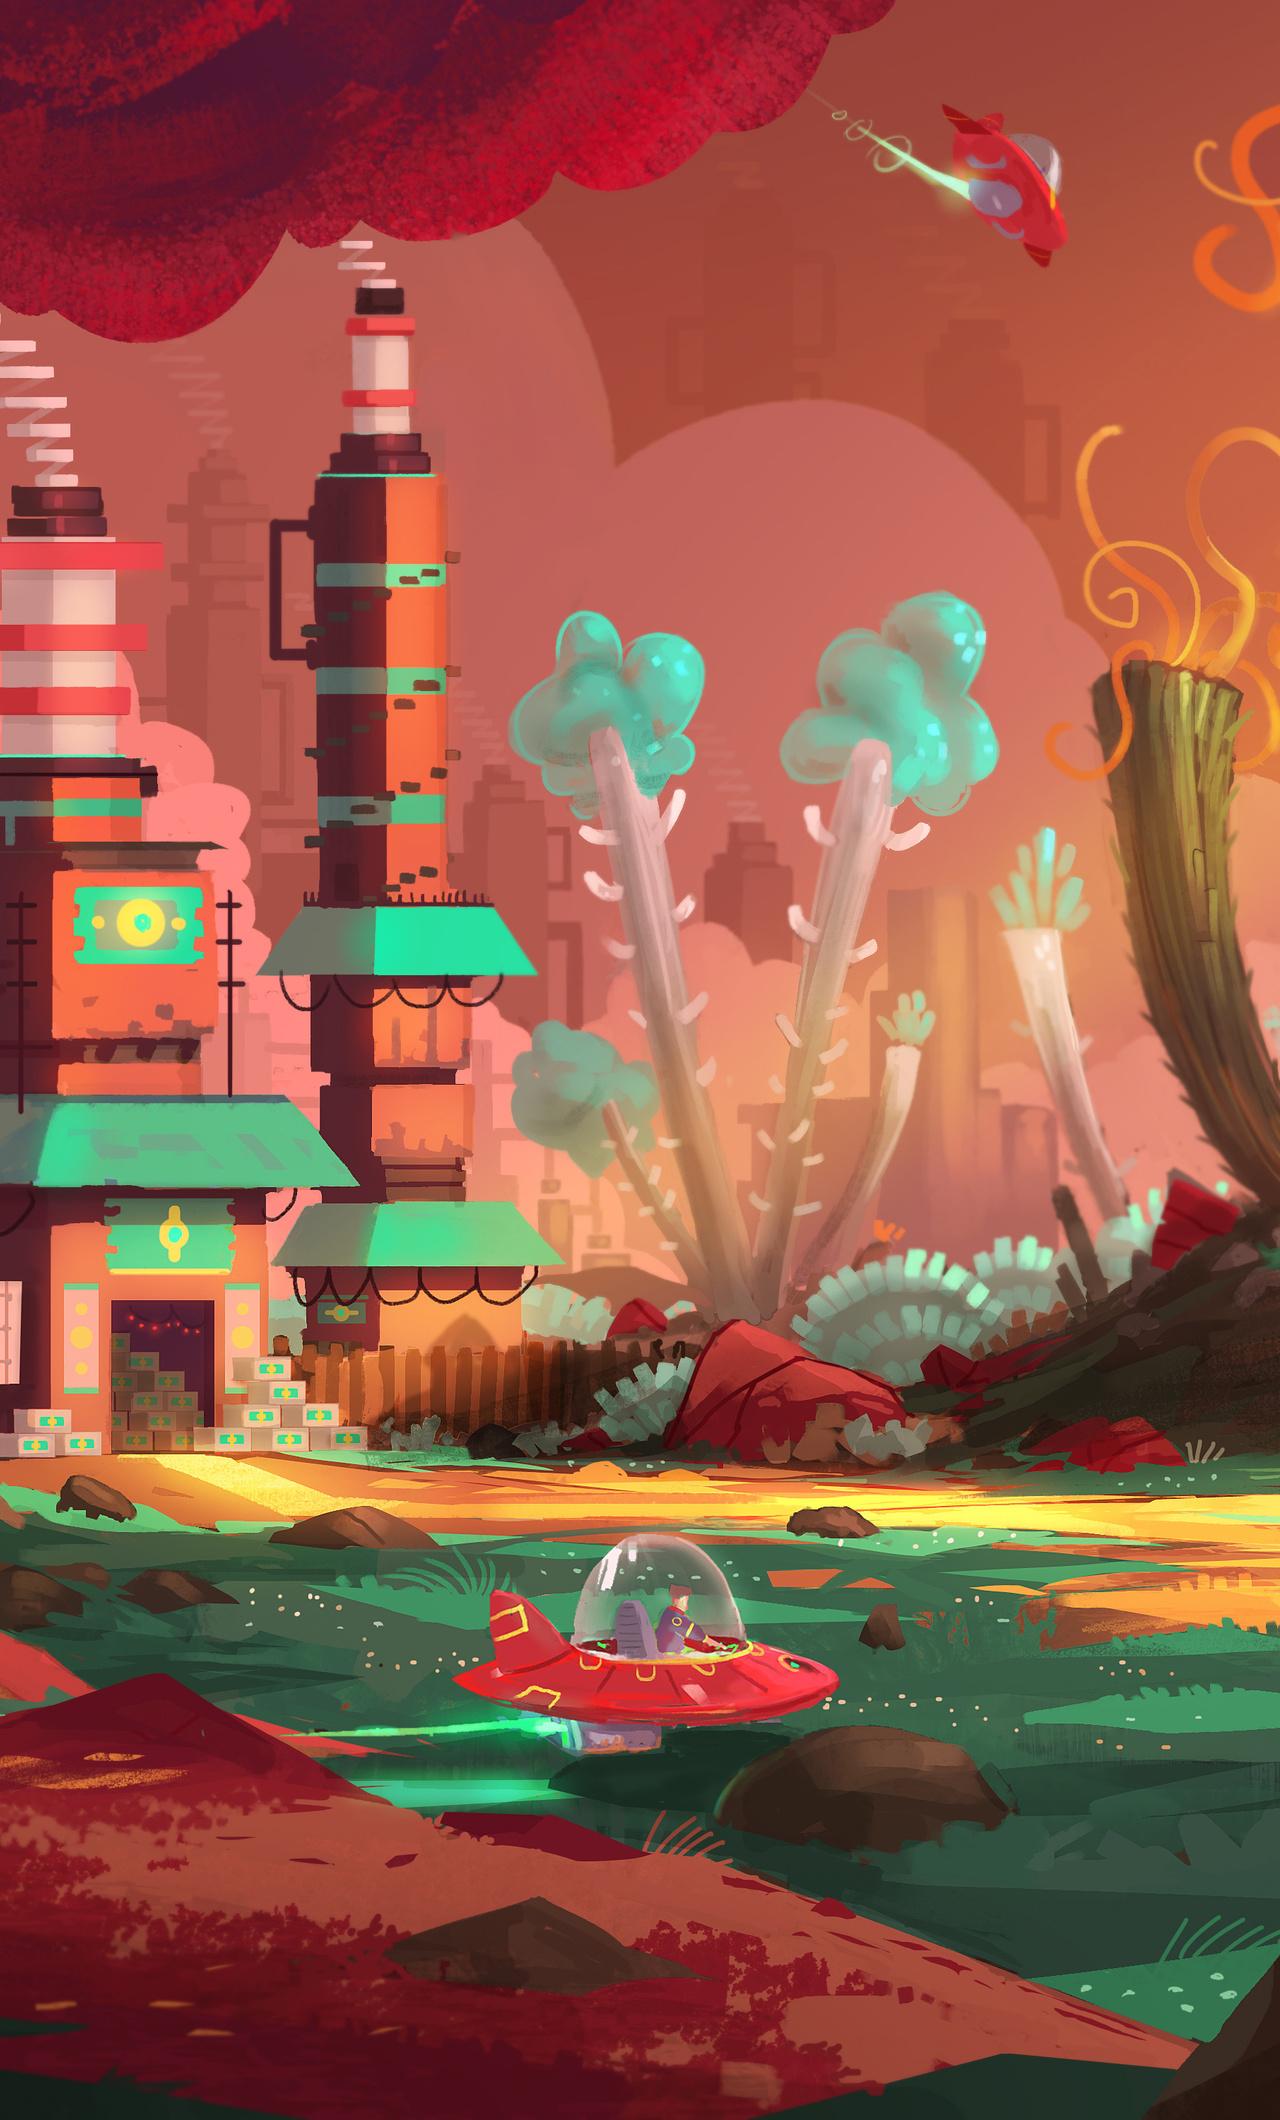 colorful-factory-concept-art-spaceship-planet-5k-6d.jpg